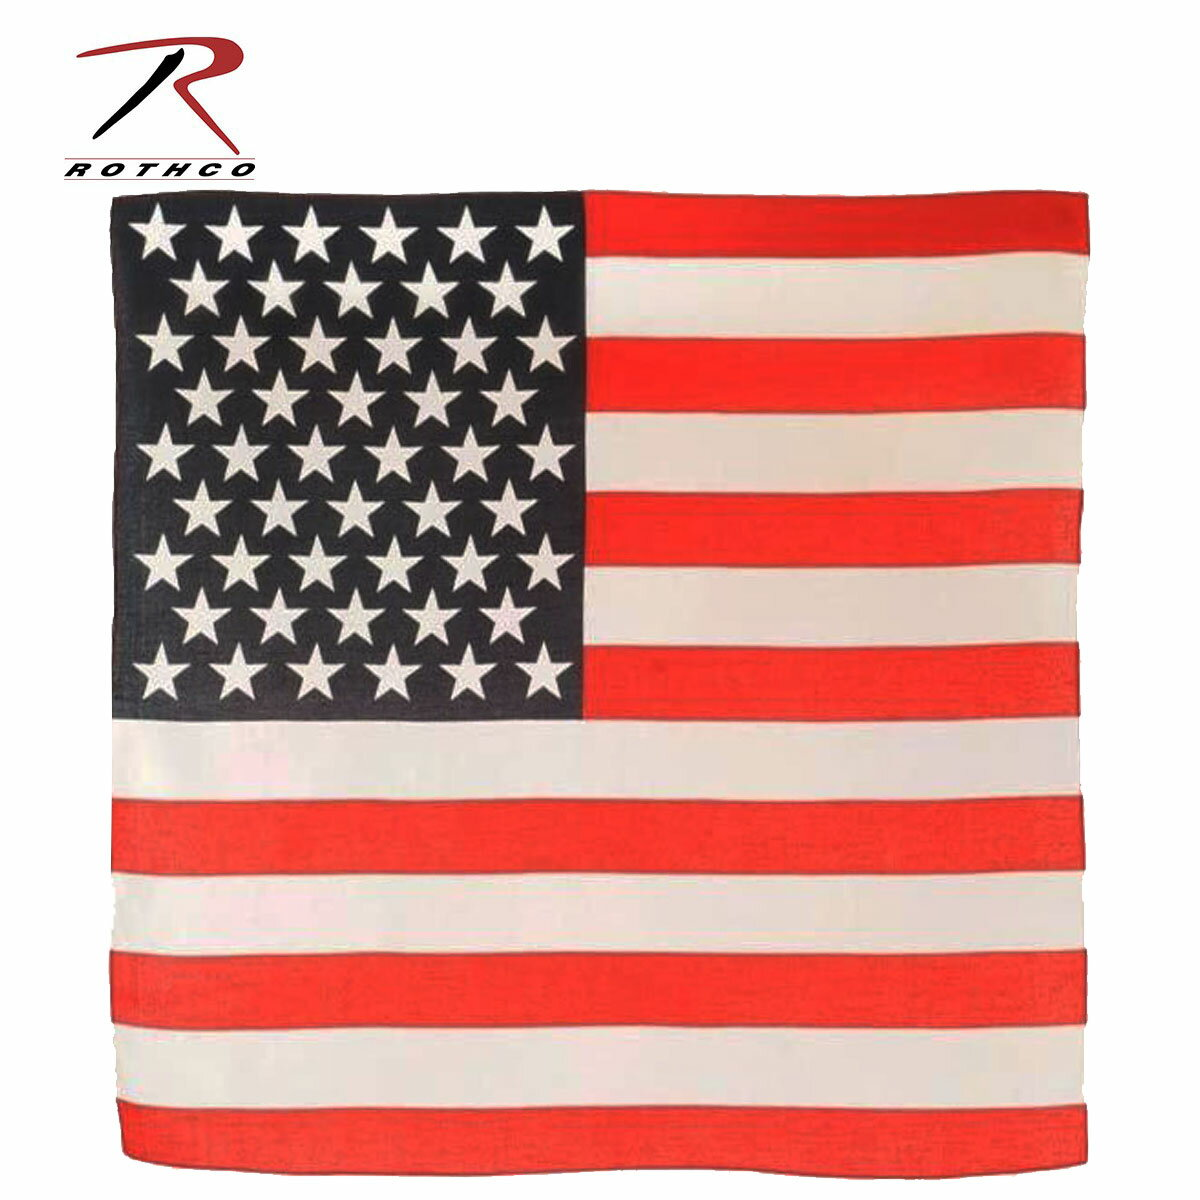 ROTHCO ロスコ BANDANA 星条旗 アメリカ